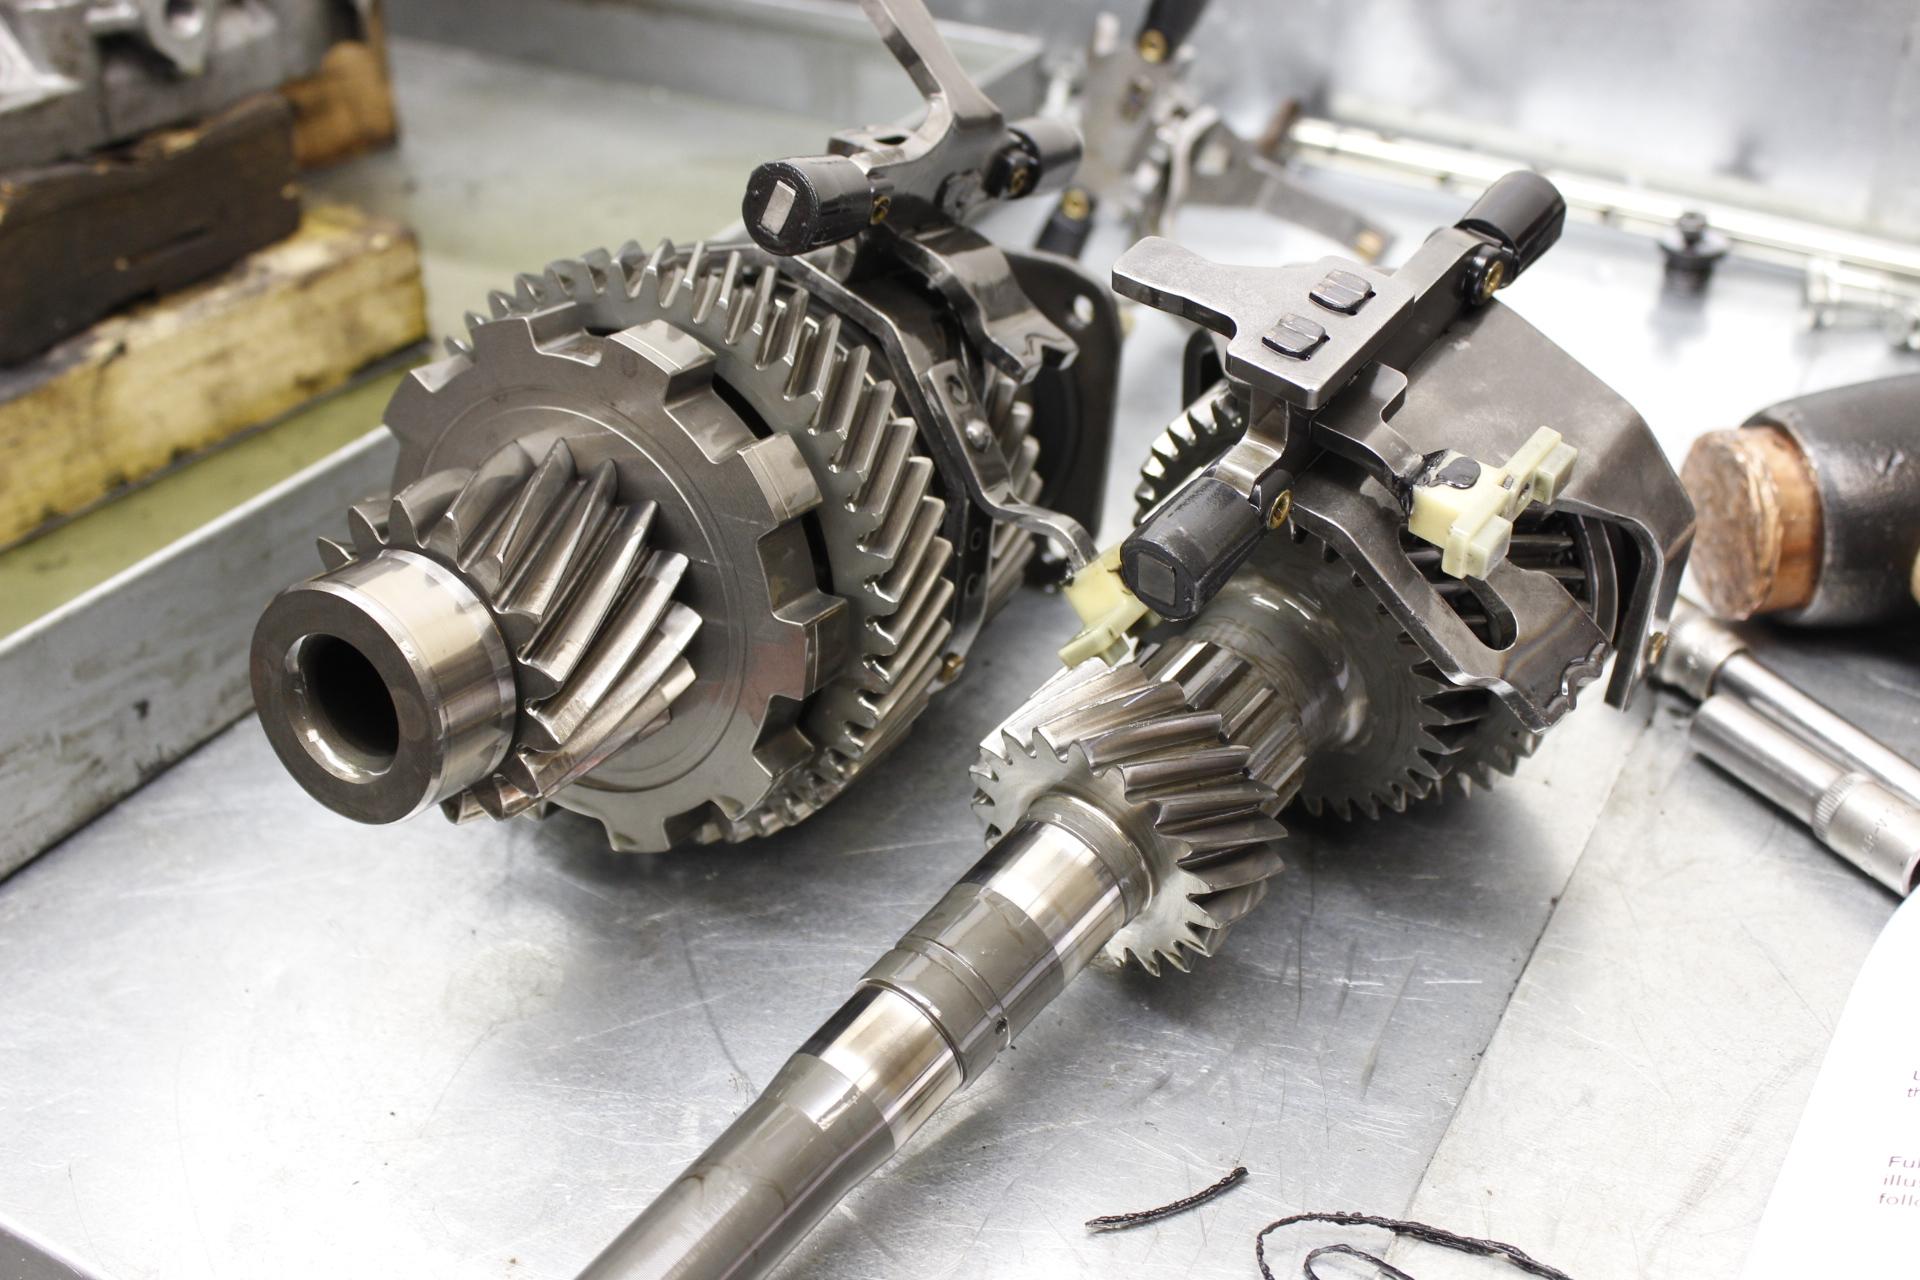 Evo X SST gearbox rebuilds